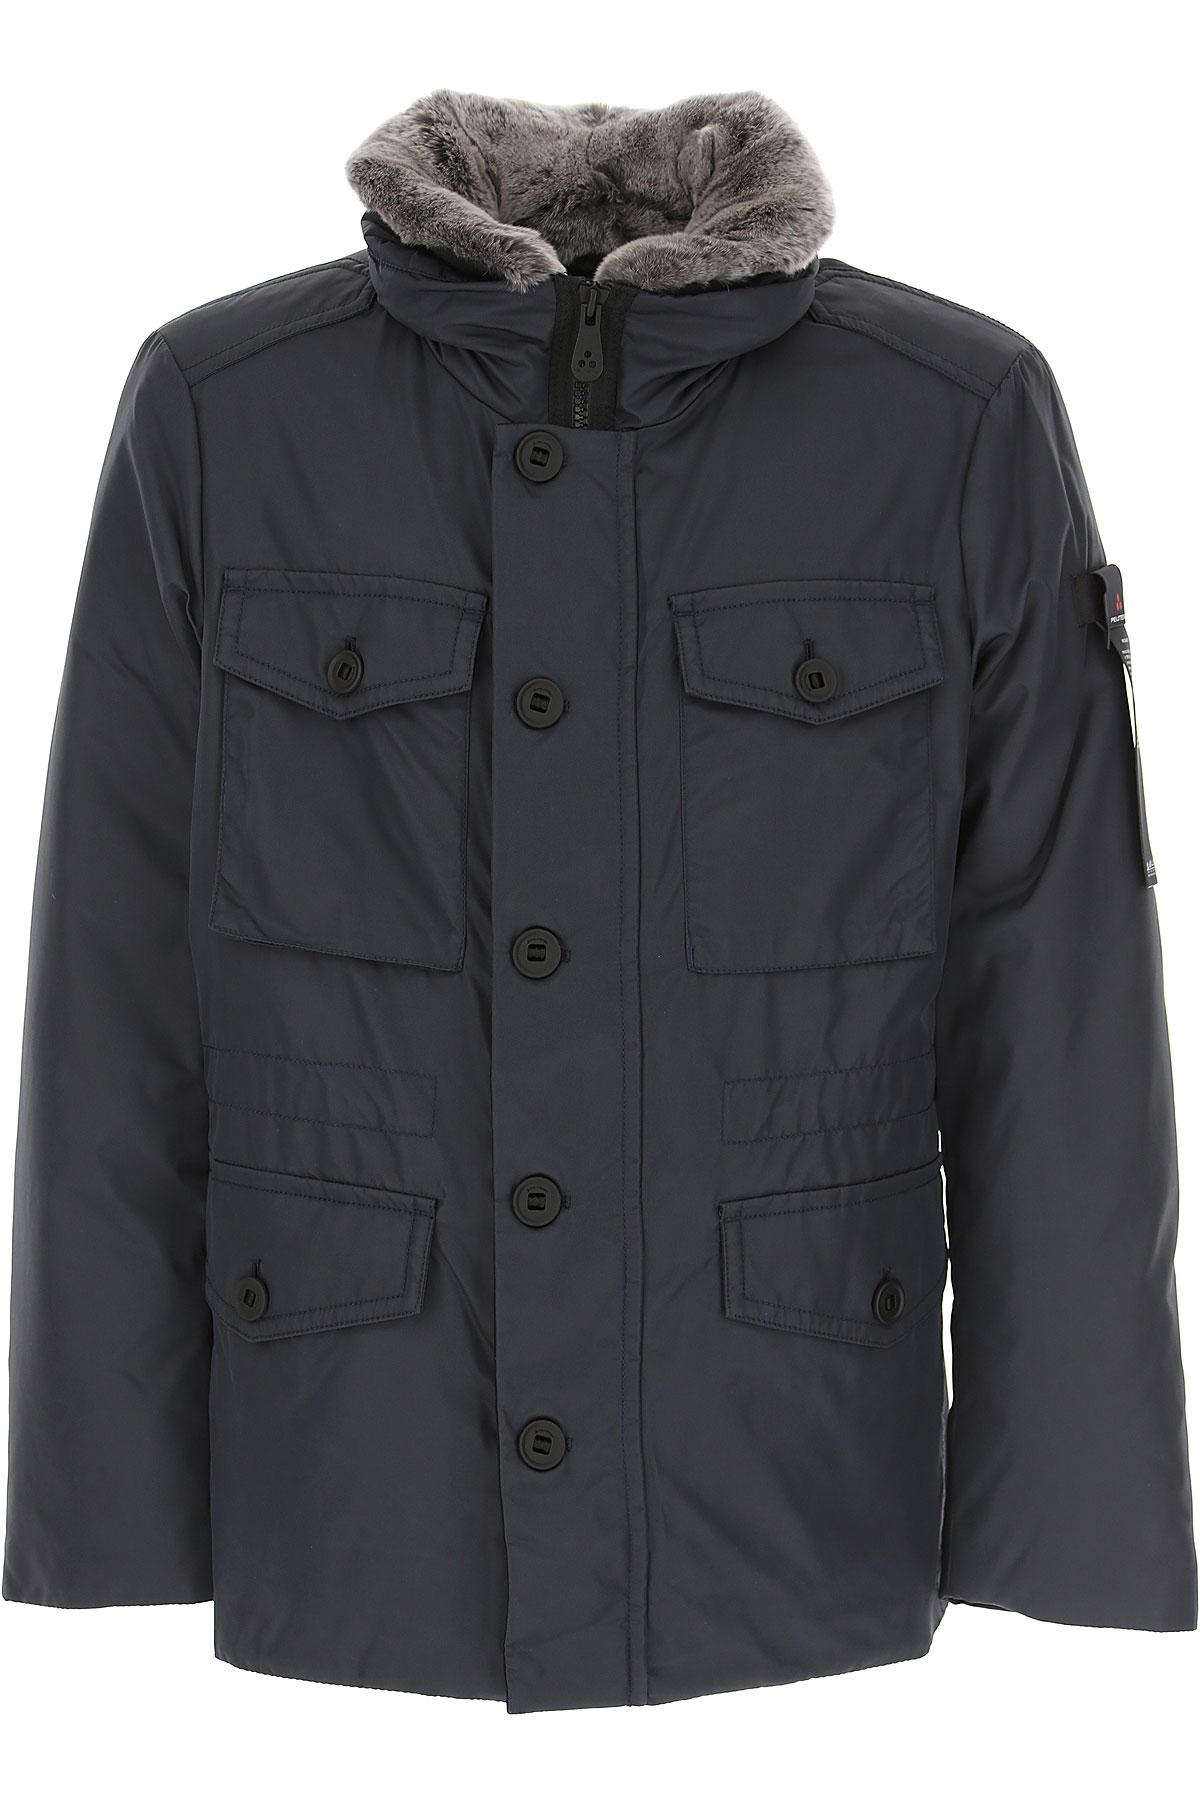 Peuterey Down Jacket for Men, Puffer Ski Jacket On Sale, Midnight Blue, Down, 2019, L M XL XXL